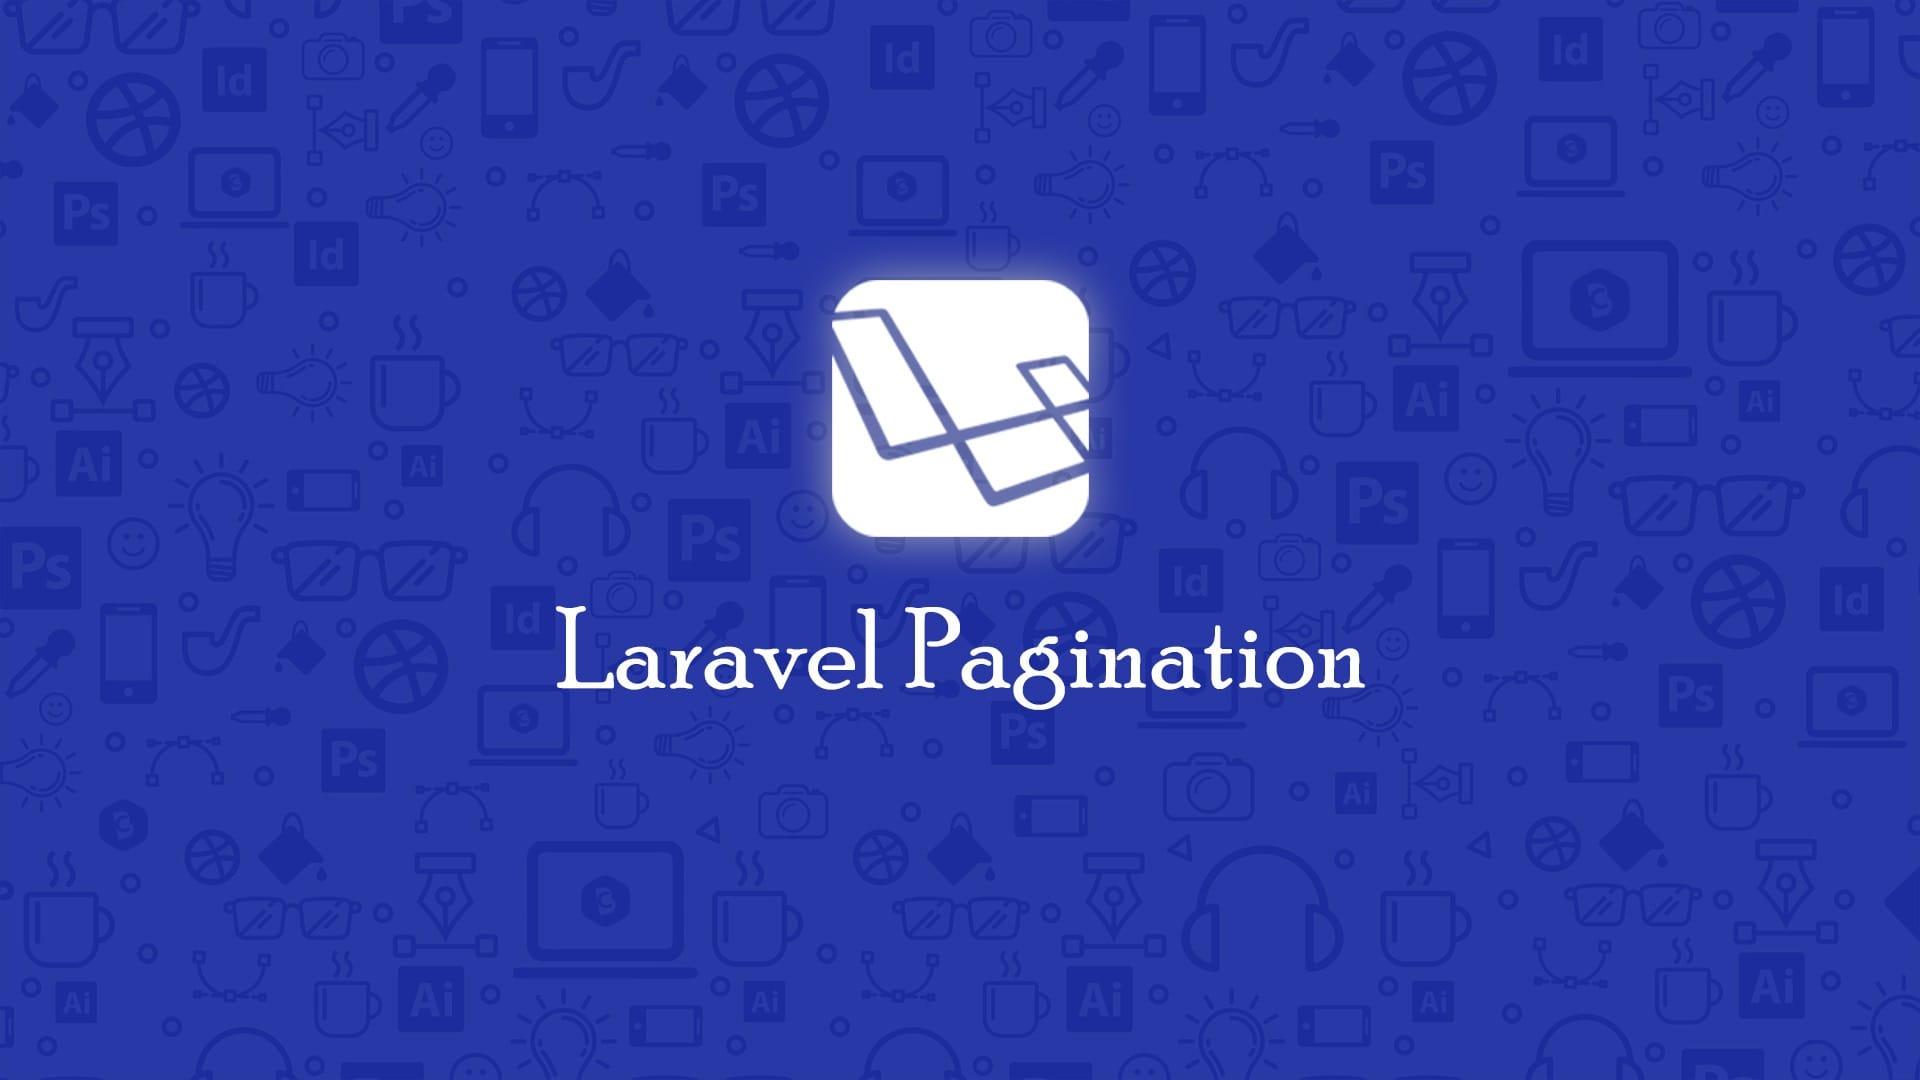 laravel自定义pagination实现ajax异步翻页